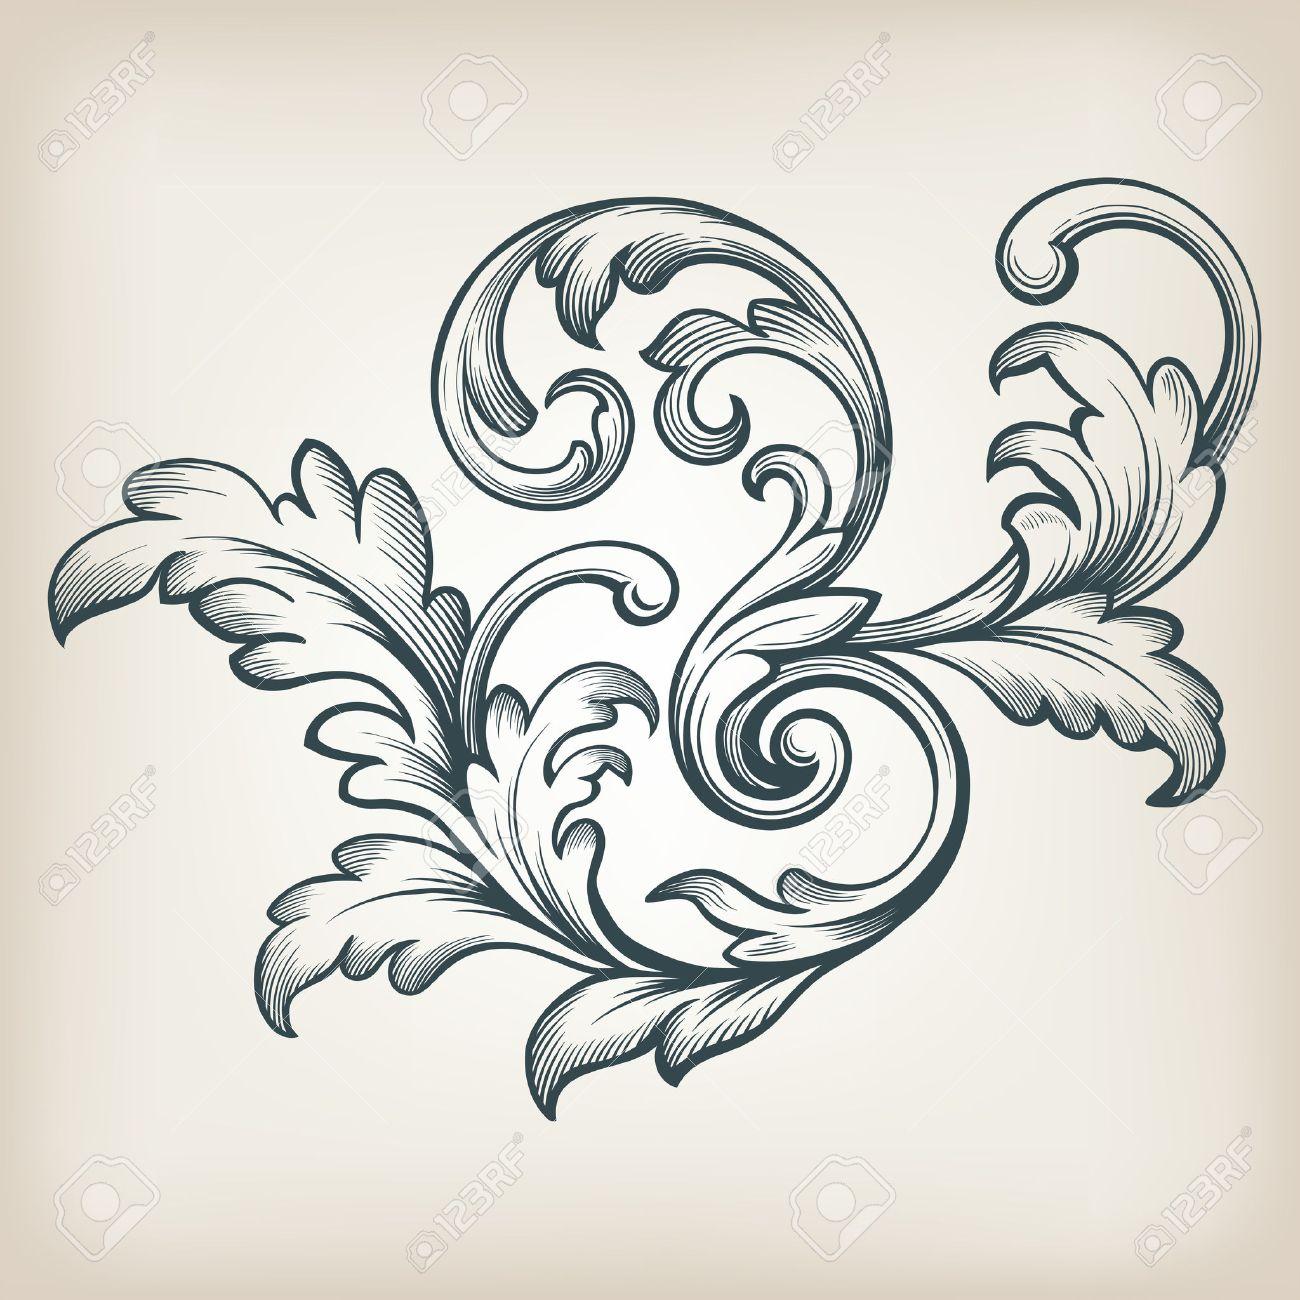 vintage Baroque scroll design frame engraving acanthus floral border pattern element retro style filigree vector - 32881590